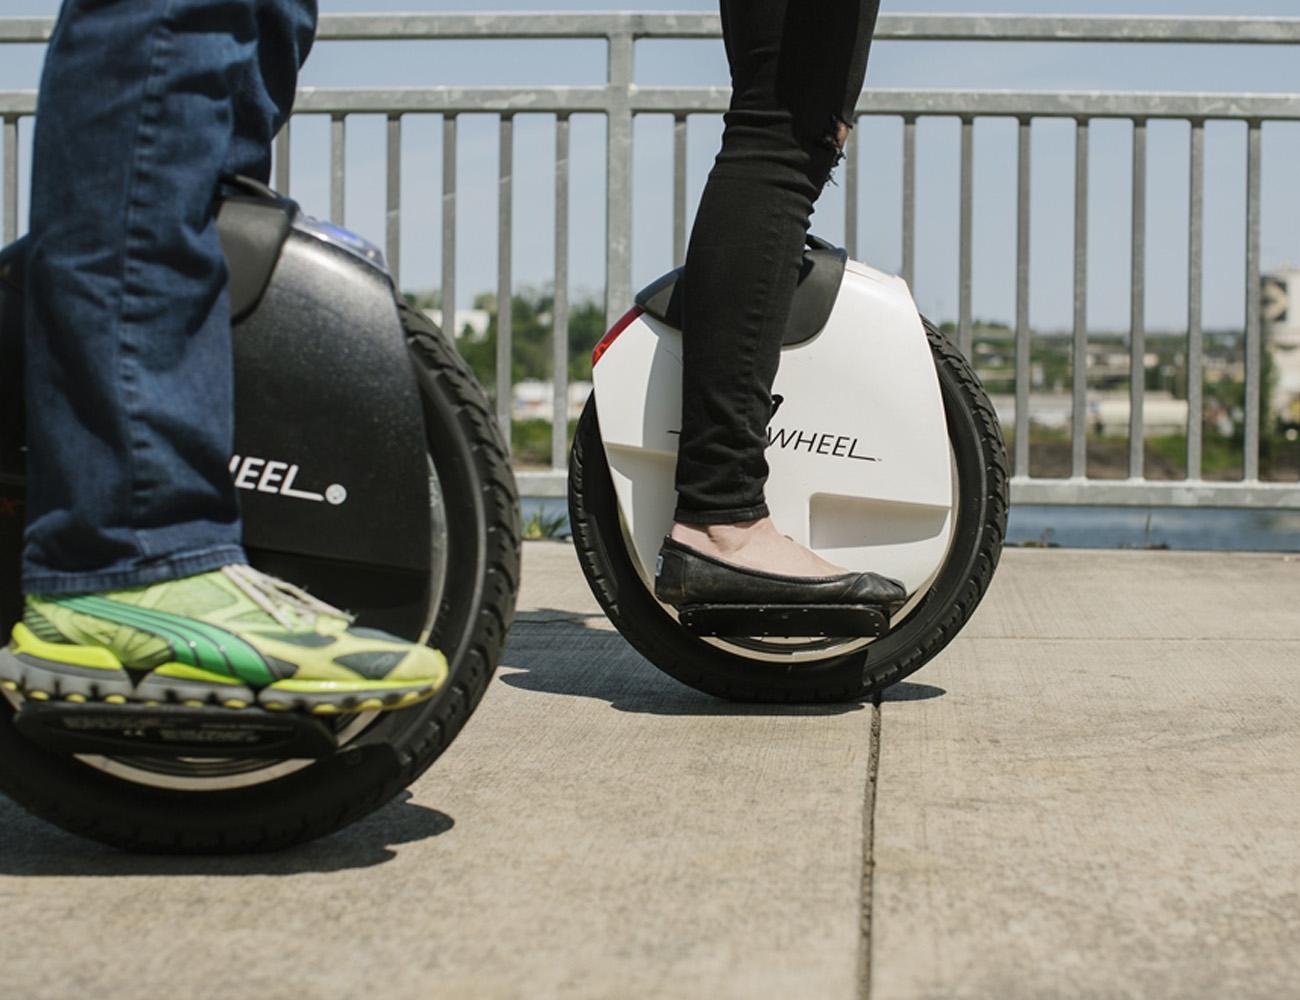 solowheel-xtreme-electric-unicycle-04